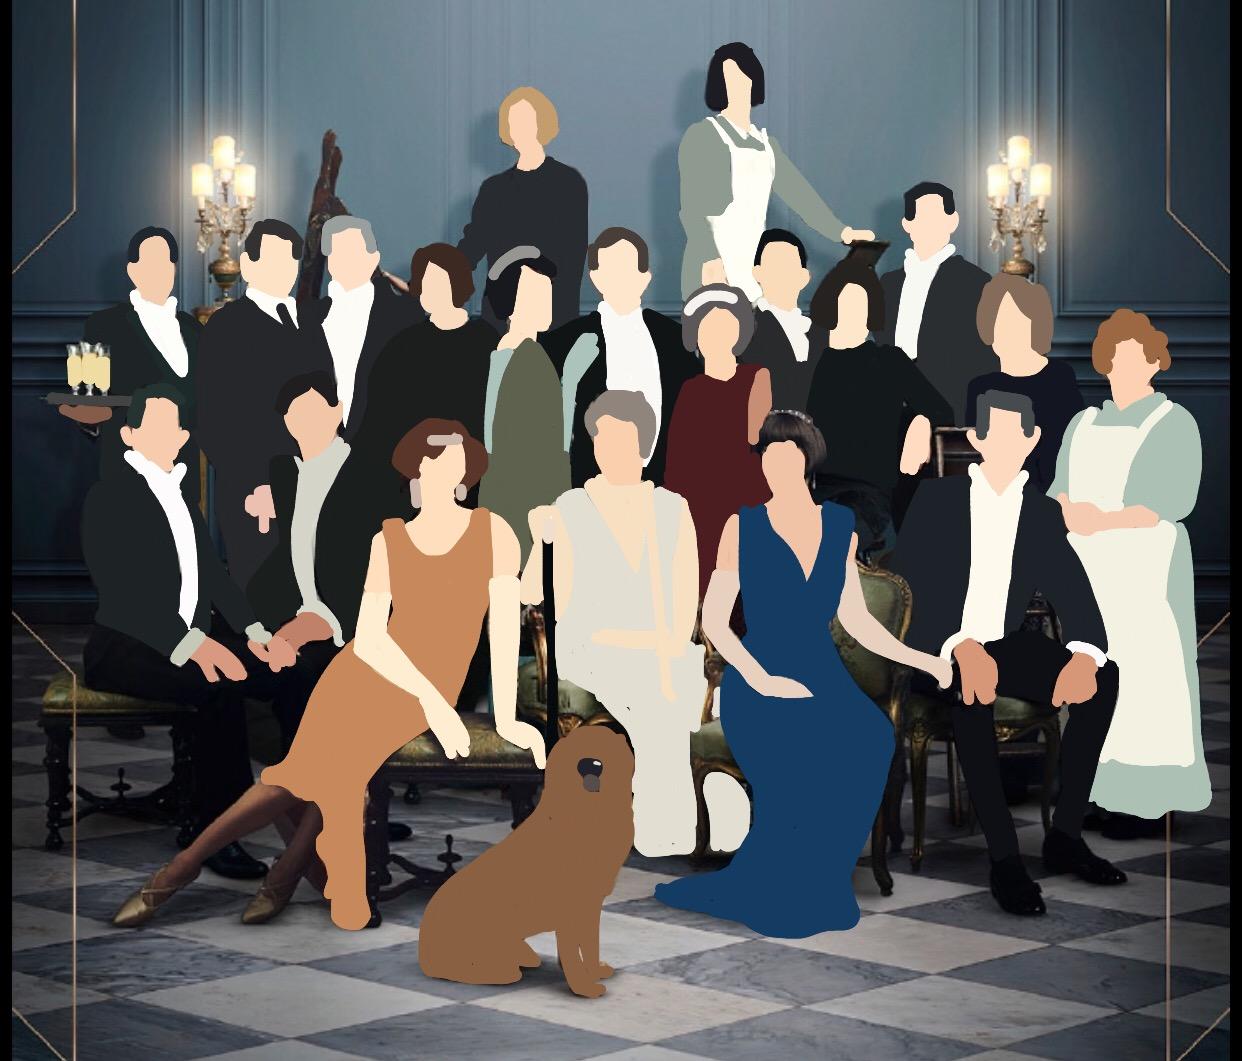 Cartoon Downton Abbey movie poster created by Katie Kerrigan.